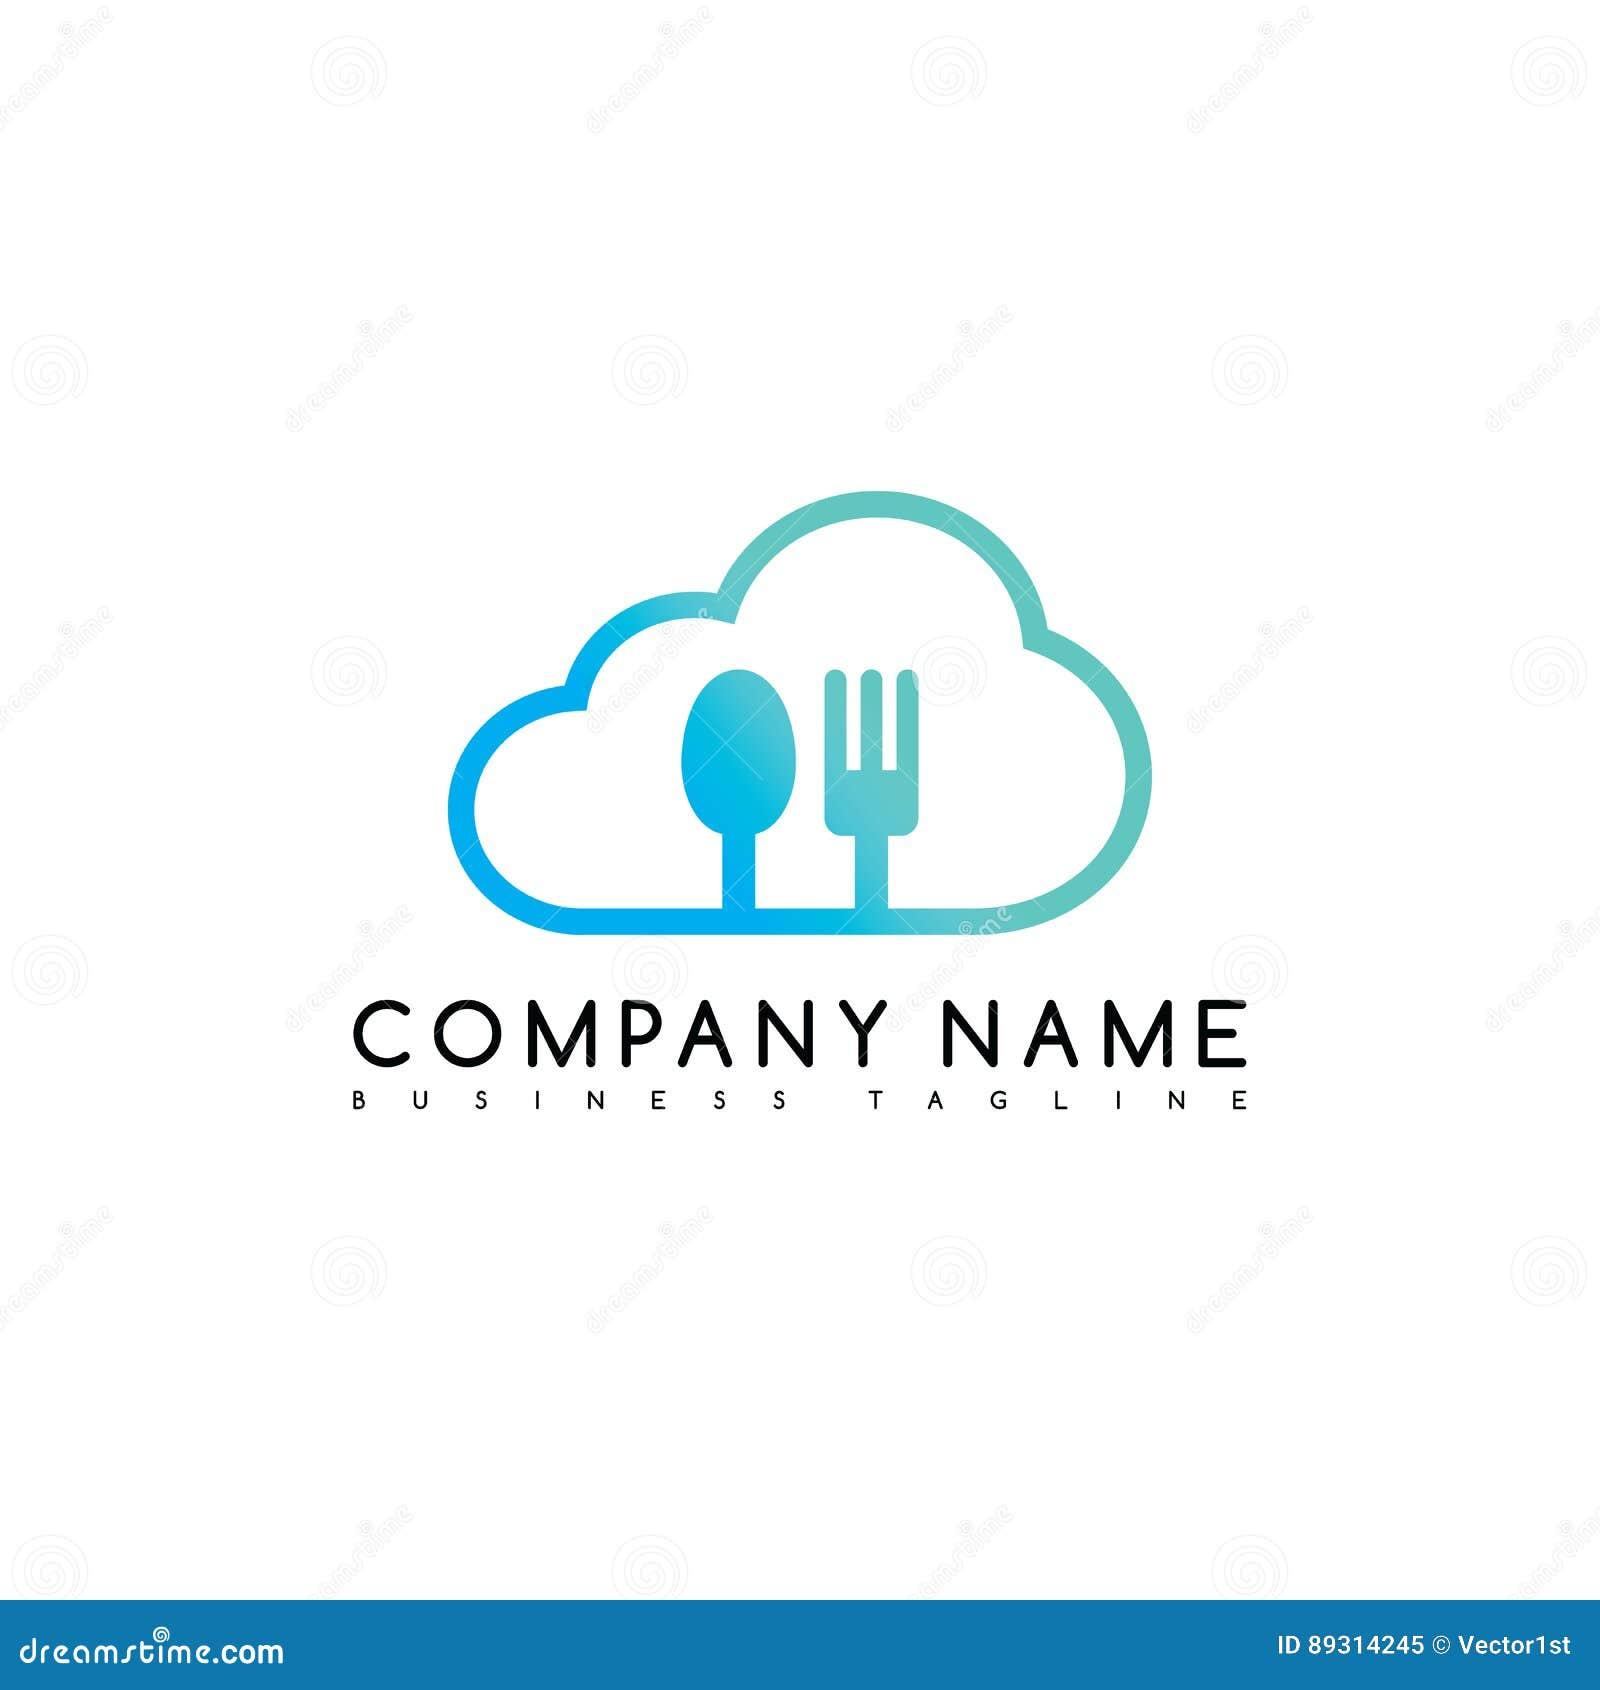 b59a7829c9d Art exclusif de logotype de logo de calibre de société de marque de nuage  de restaurant